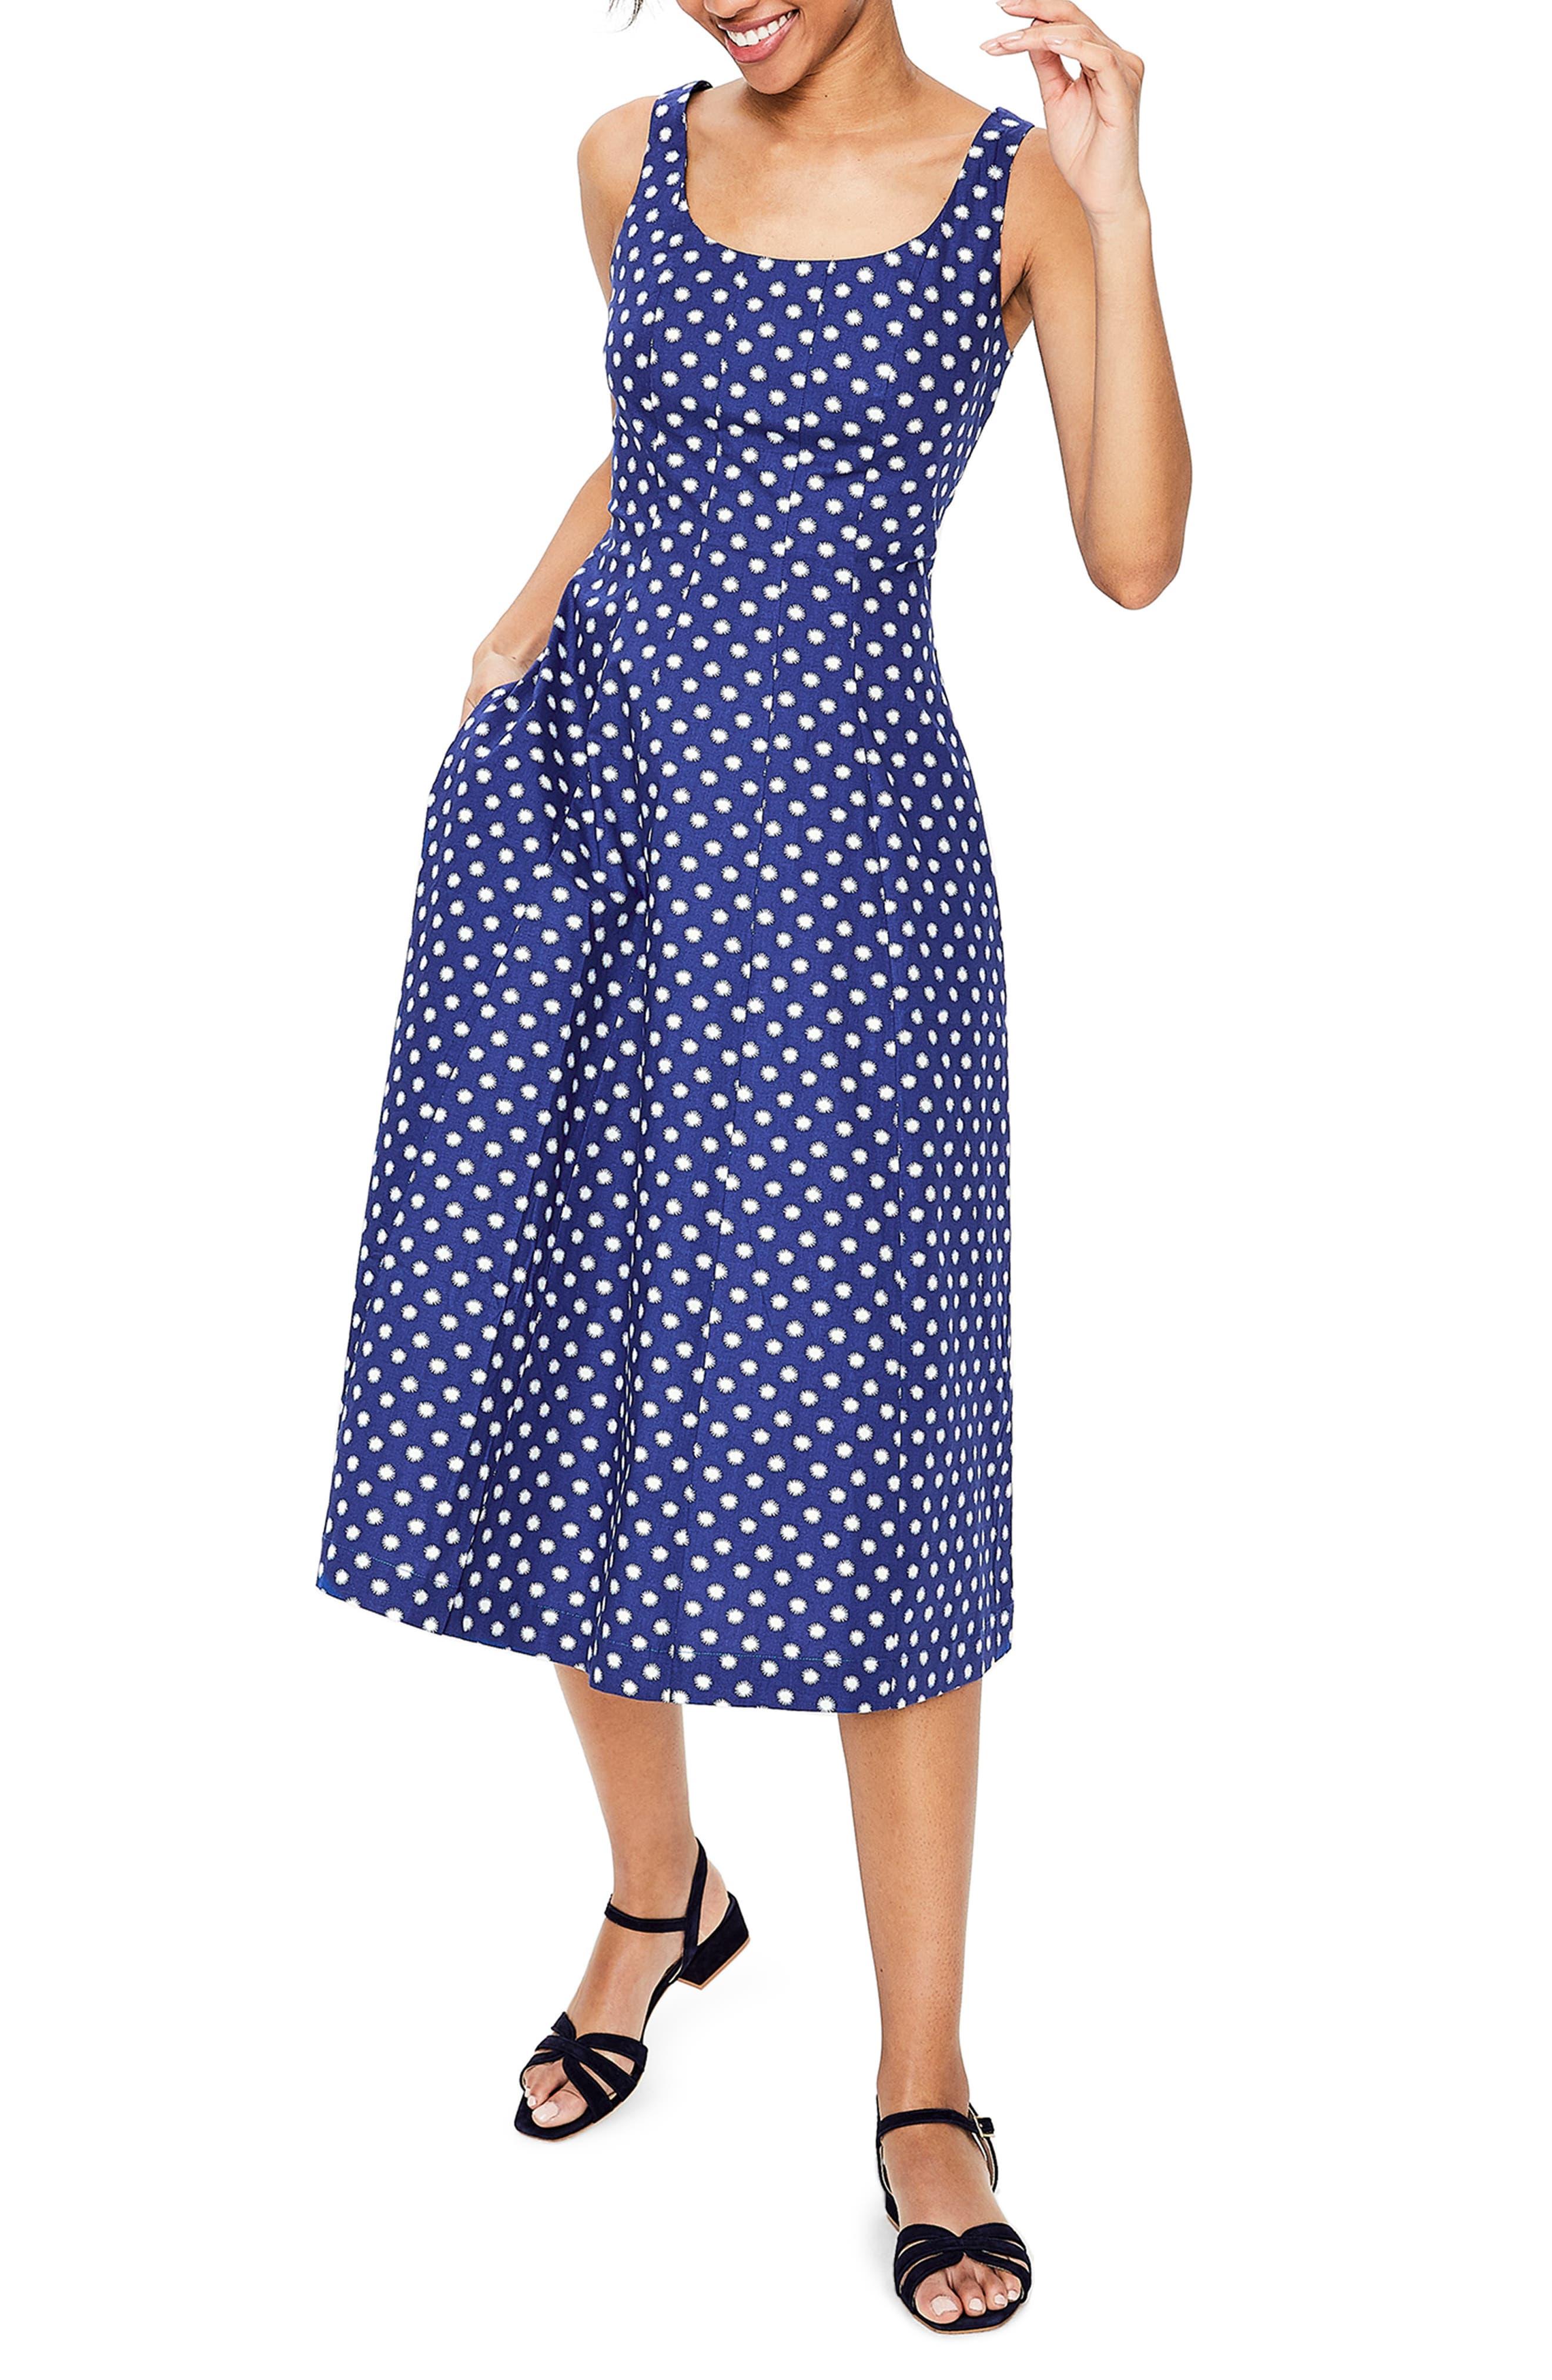 Boden Sabina Fit & Flare Midi Dress, Blue